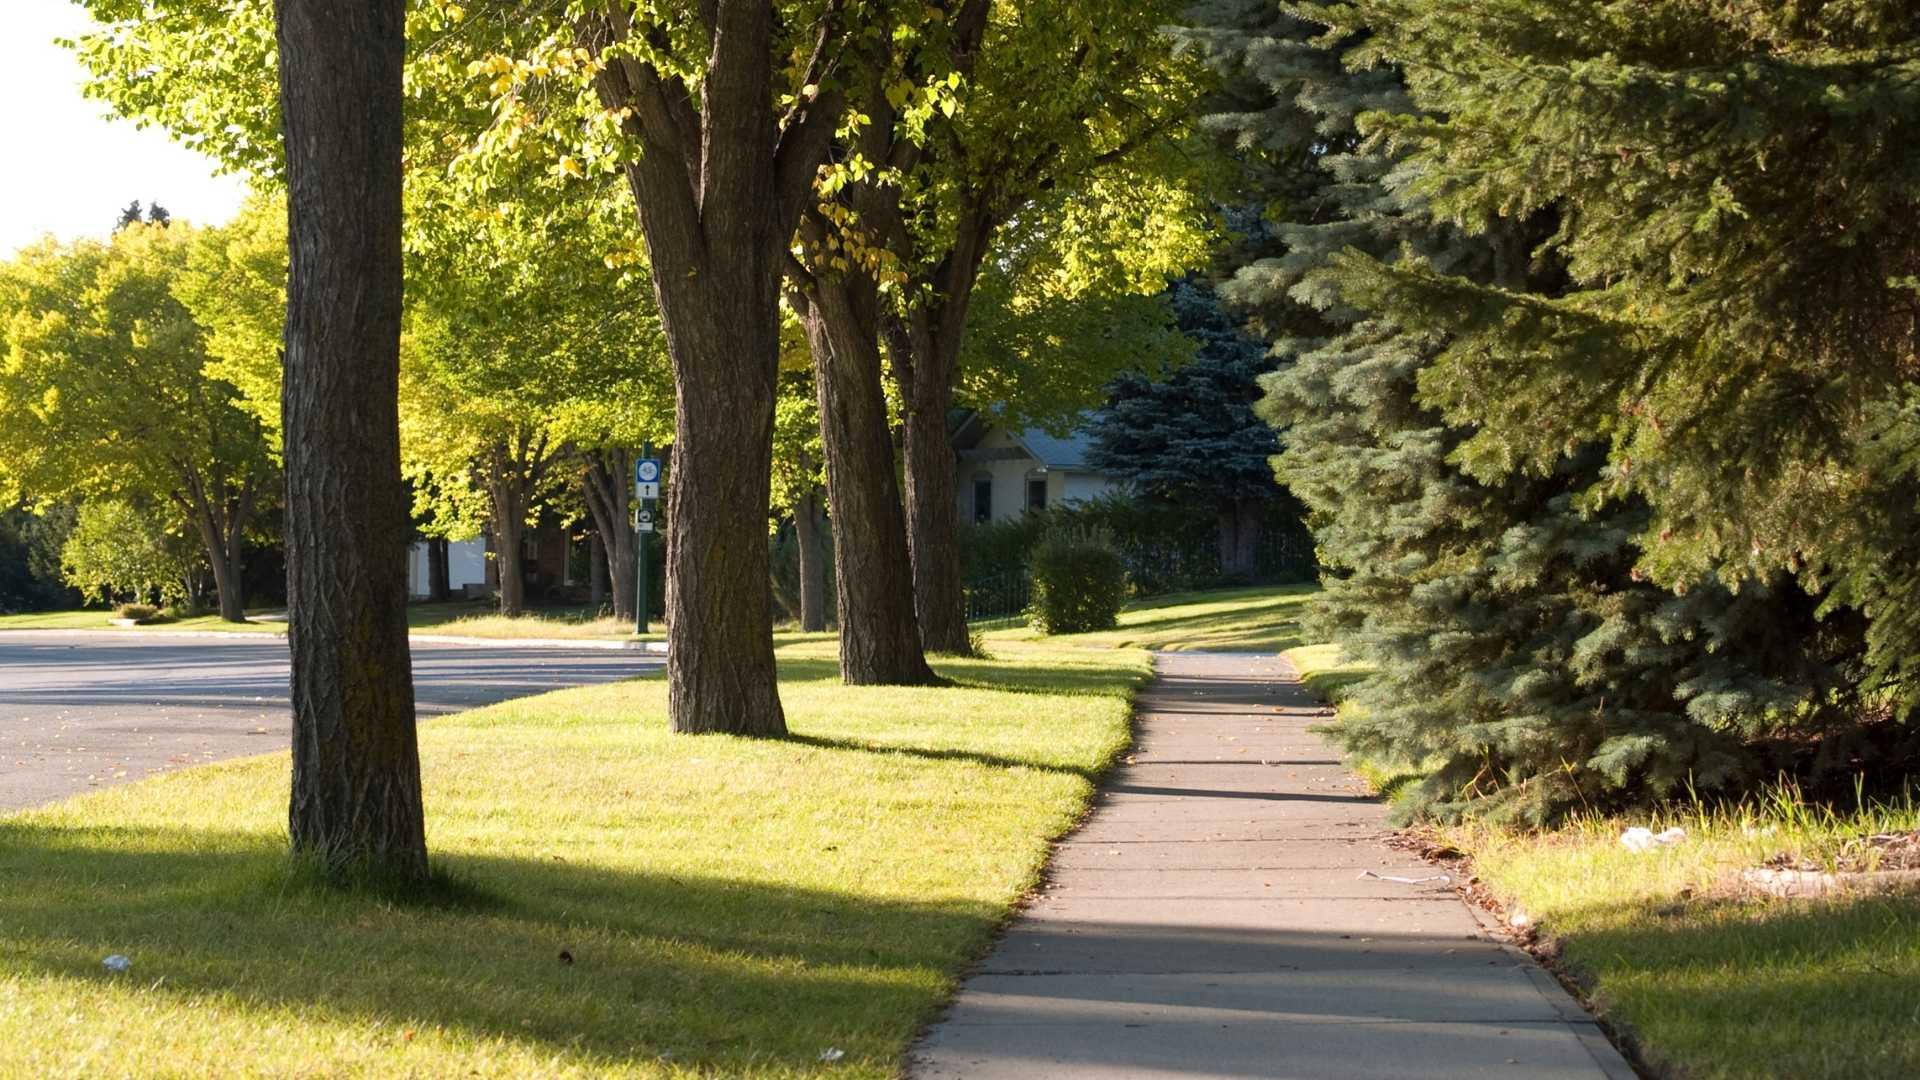 Trees Near Sidewalk